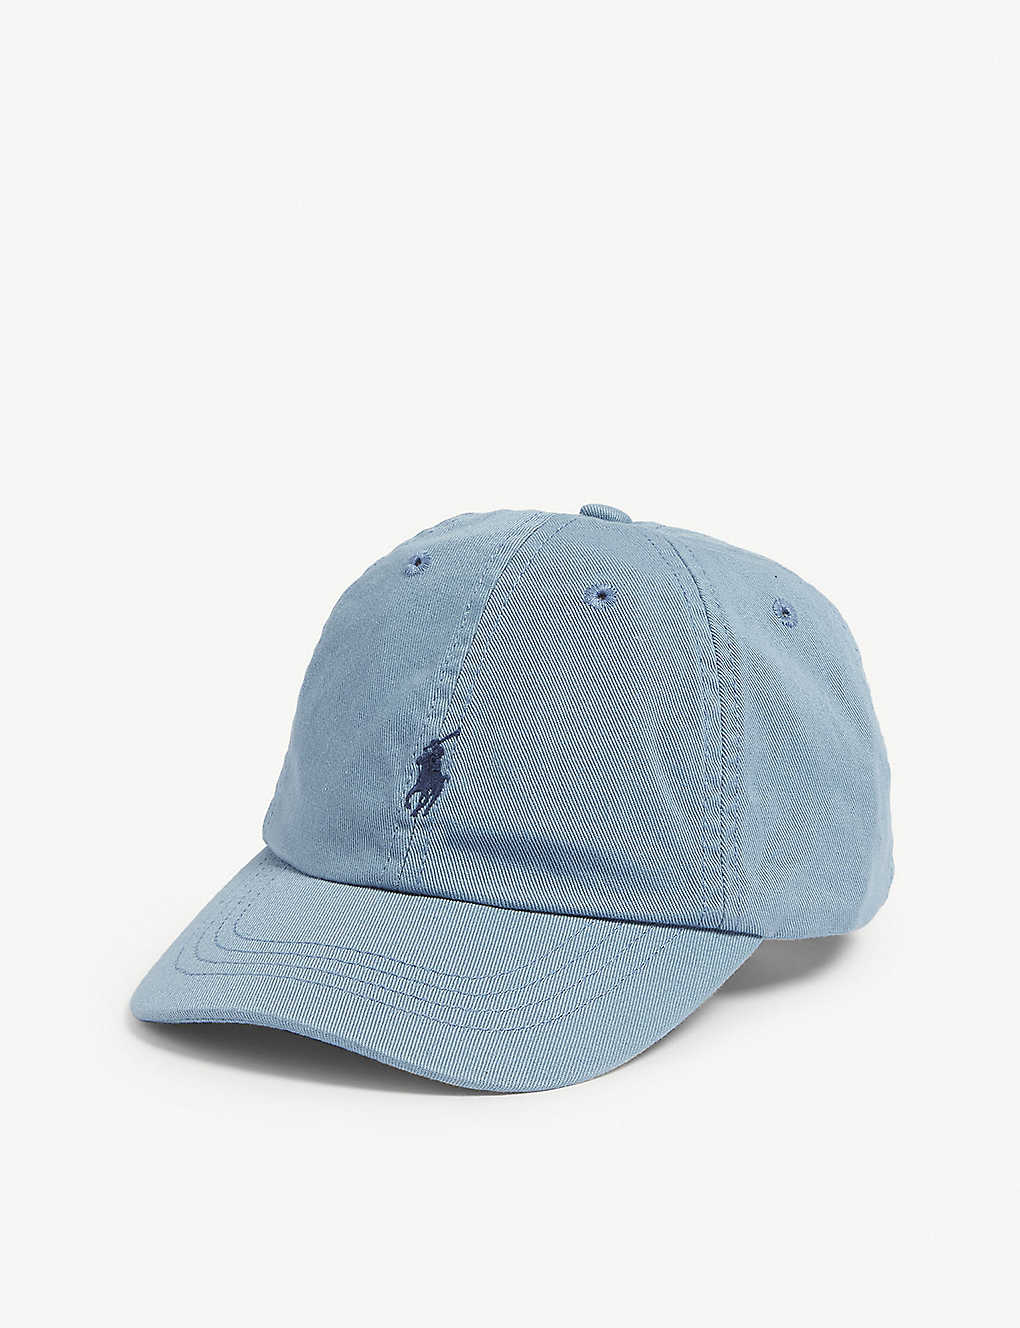 1daa7a677dfc RALPH LAUREN - Embroidered-logo cotton chino baseball cap ...